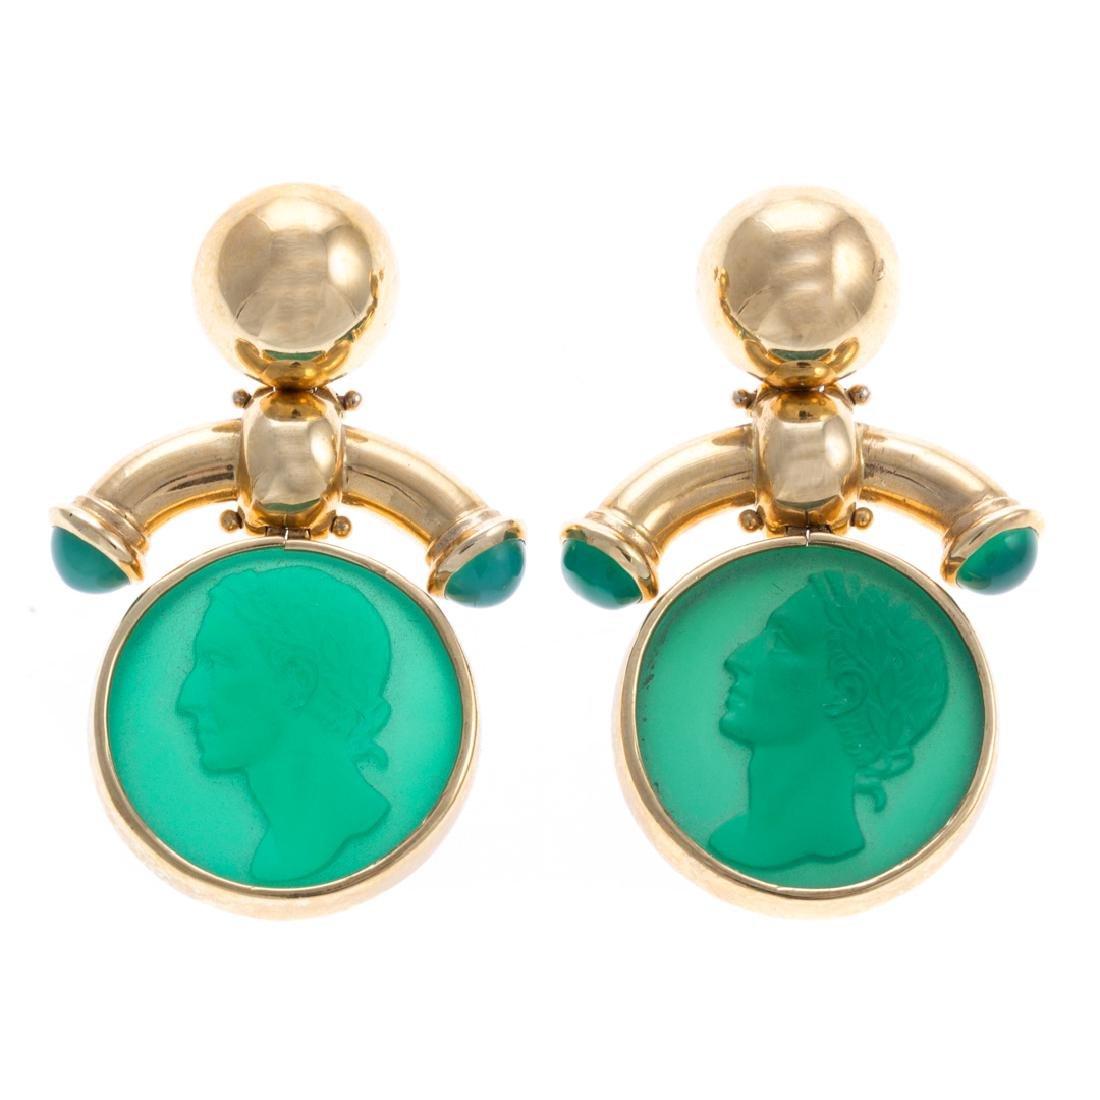 A Pair of 18K Green Intaglio Earrings